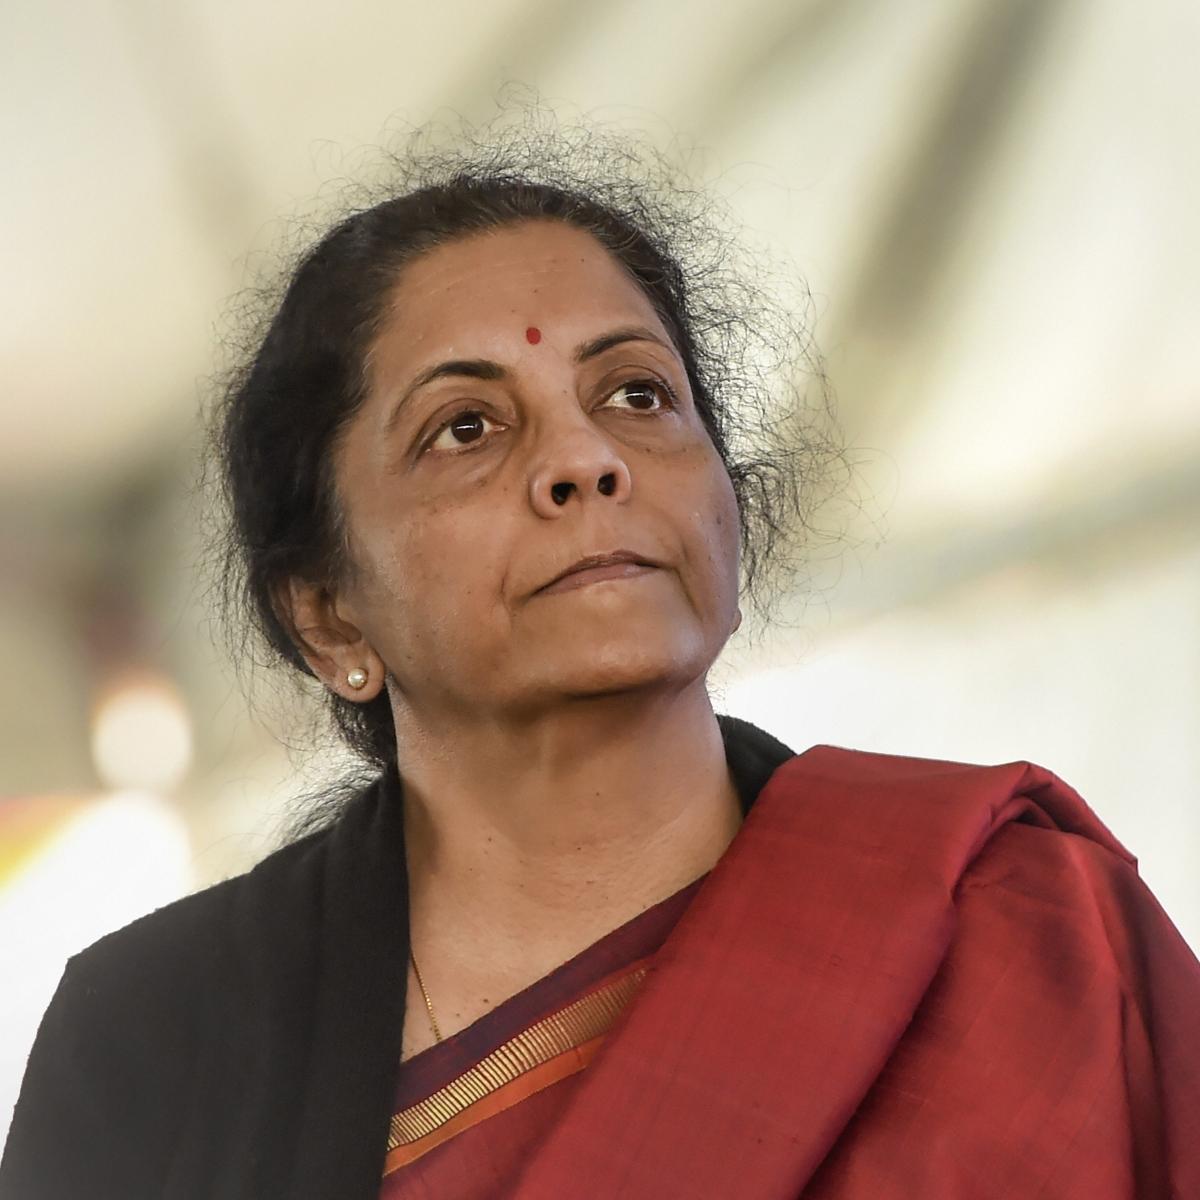 Budget 2020: How Modi's 'NRI tax' has left Kerala fuming